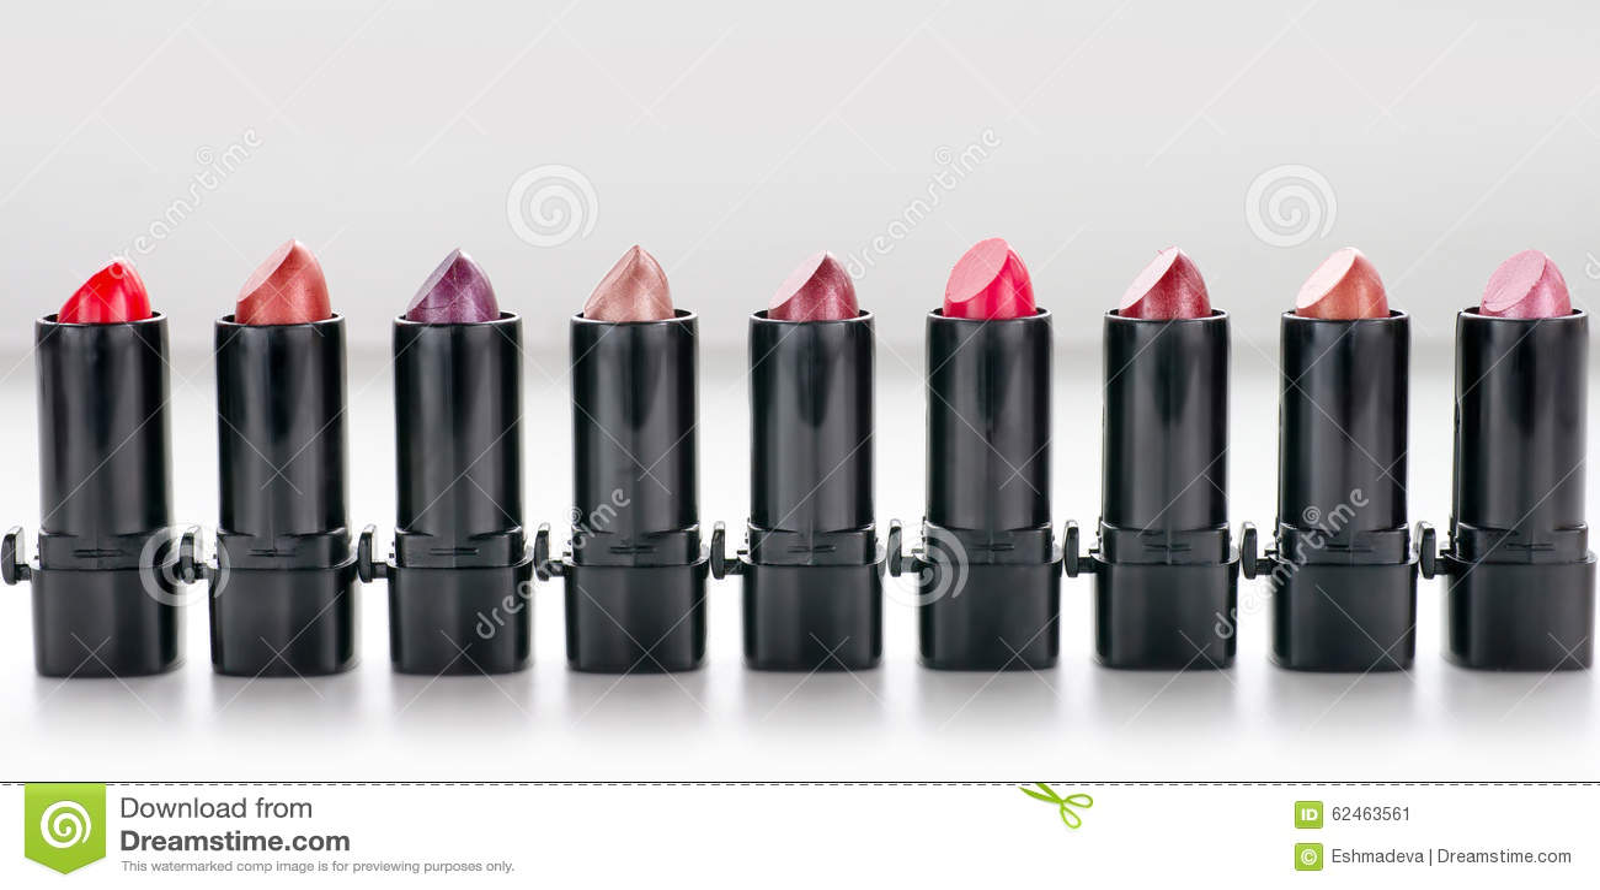 Row of red lipsticks